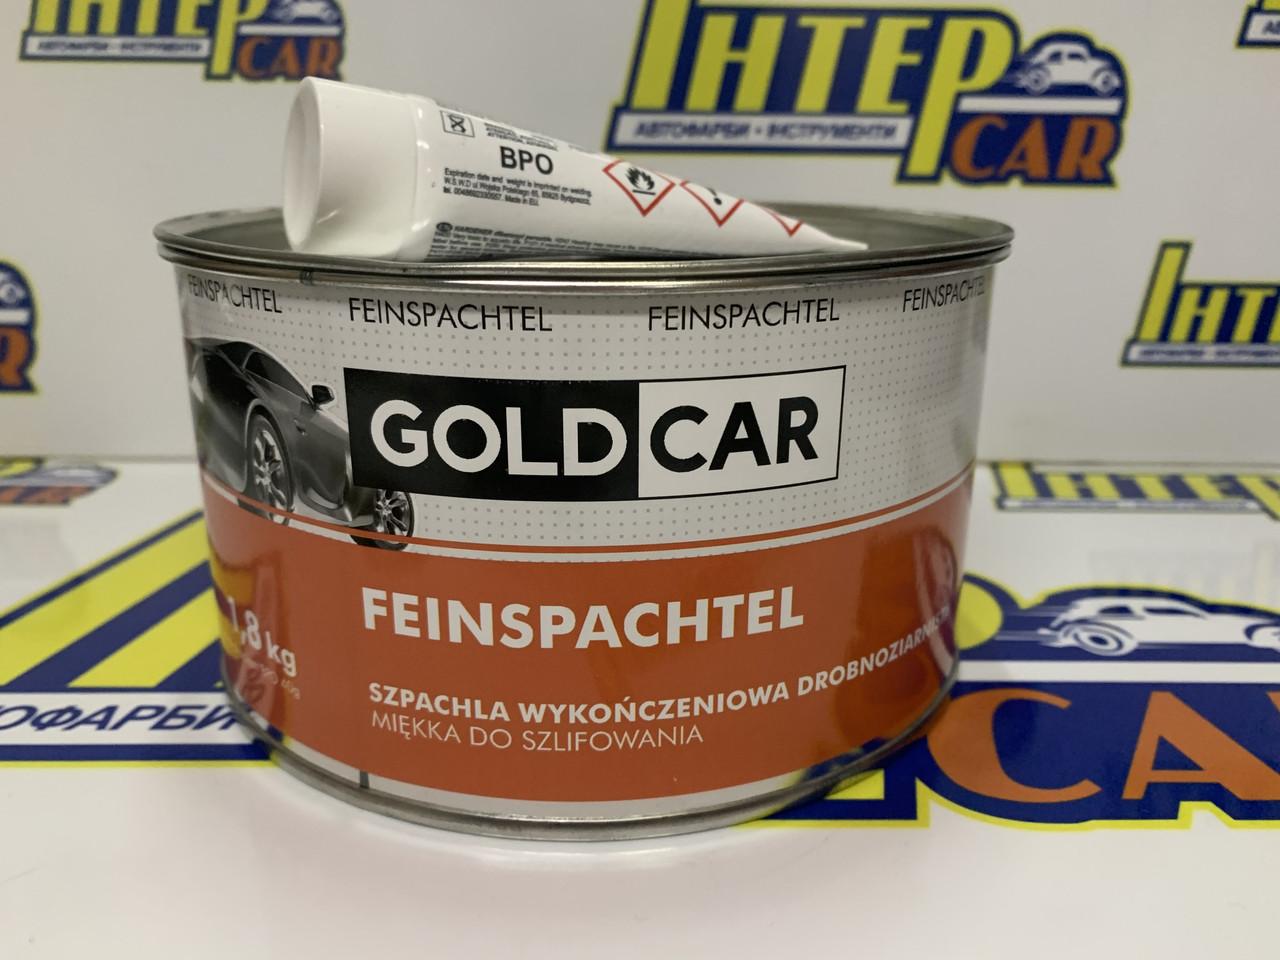 Шпатлевка GOLD CAR FEIN отделочная 1,8кг